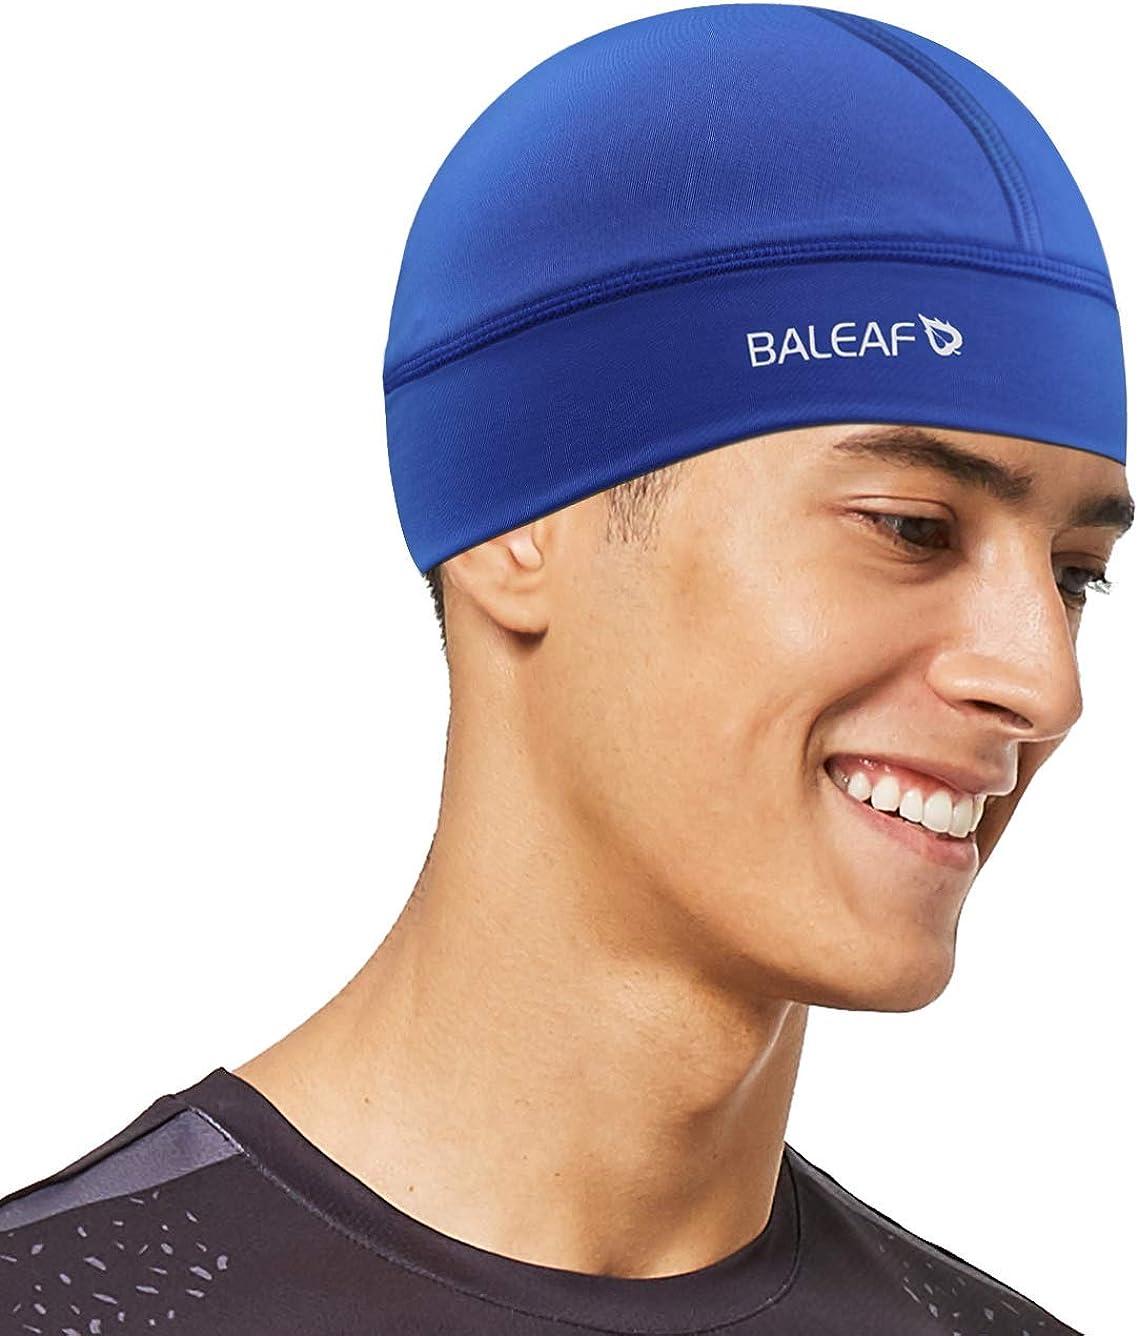 BALEAF Cooling Skull Cap Helmet Liner Cycling Bicycle Biking Running for Men Women UPF 50+